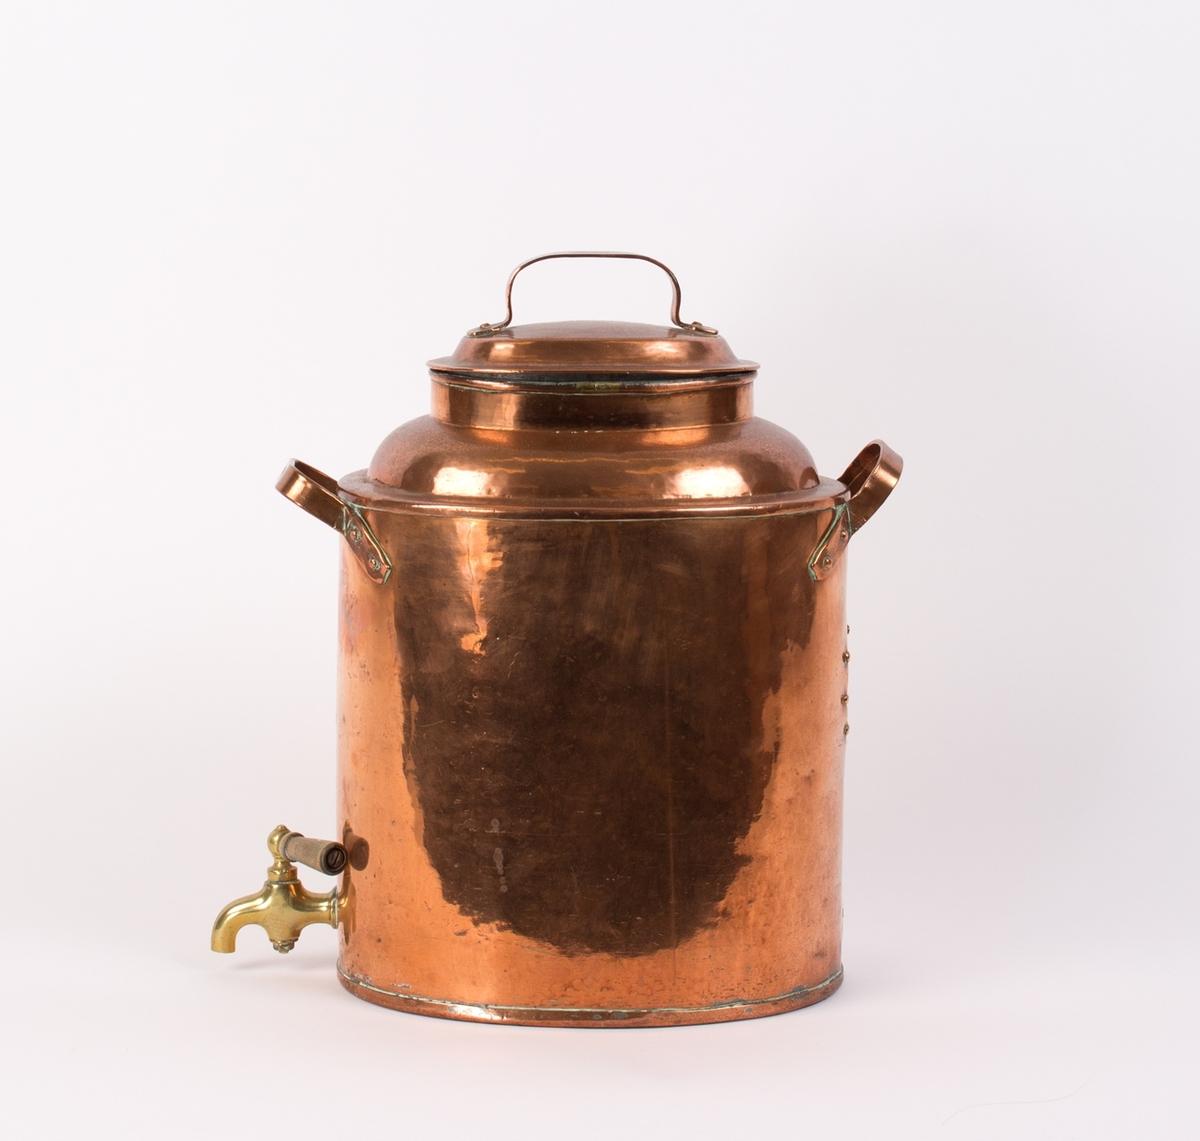 Kaffekoker i kobber med tappekran i front. Oval med lokk på toppen med hank og hank i front og på baksiden.